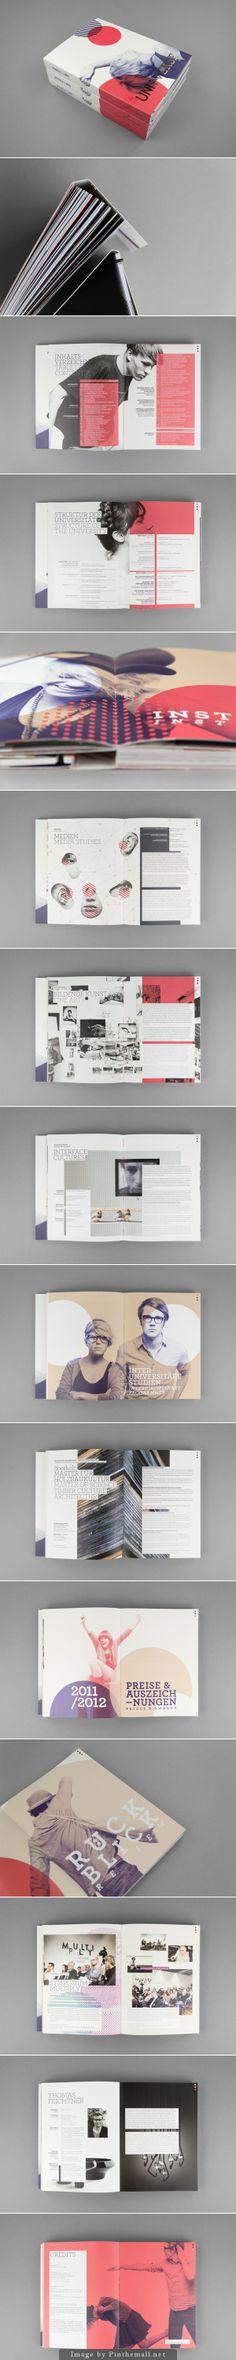 Universe 2012 brochure by MOOI design